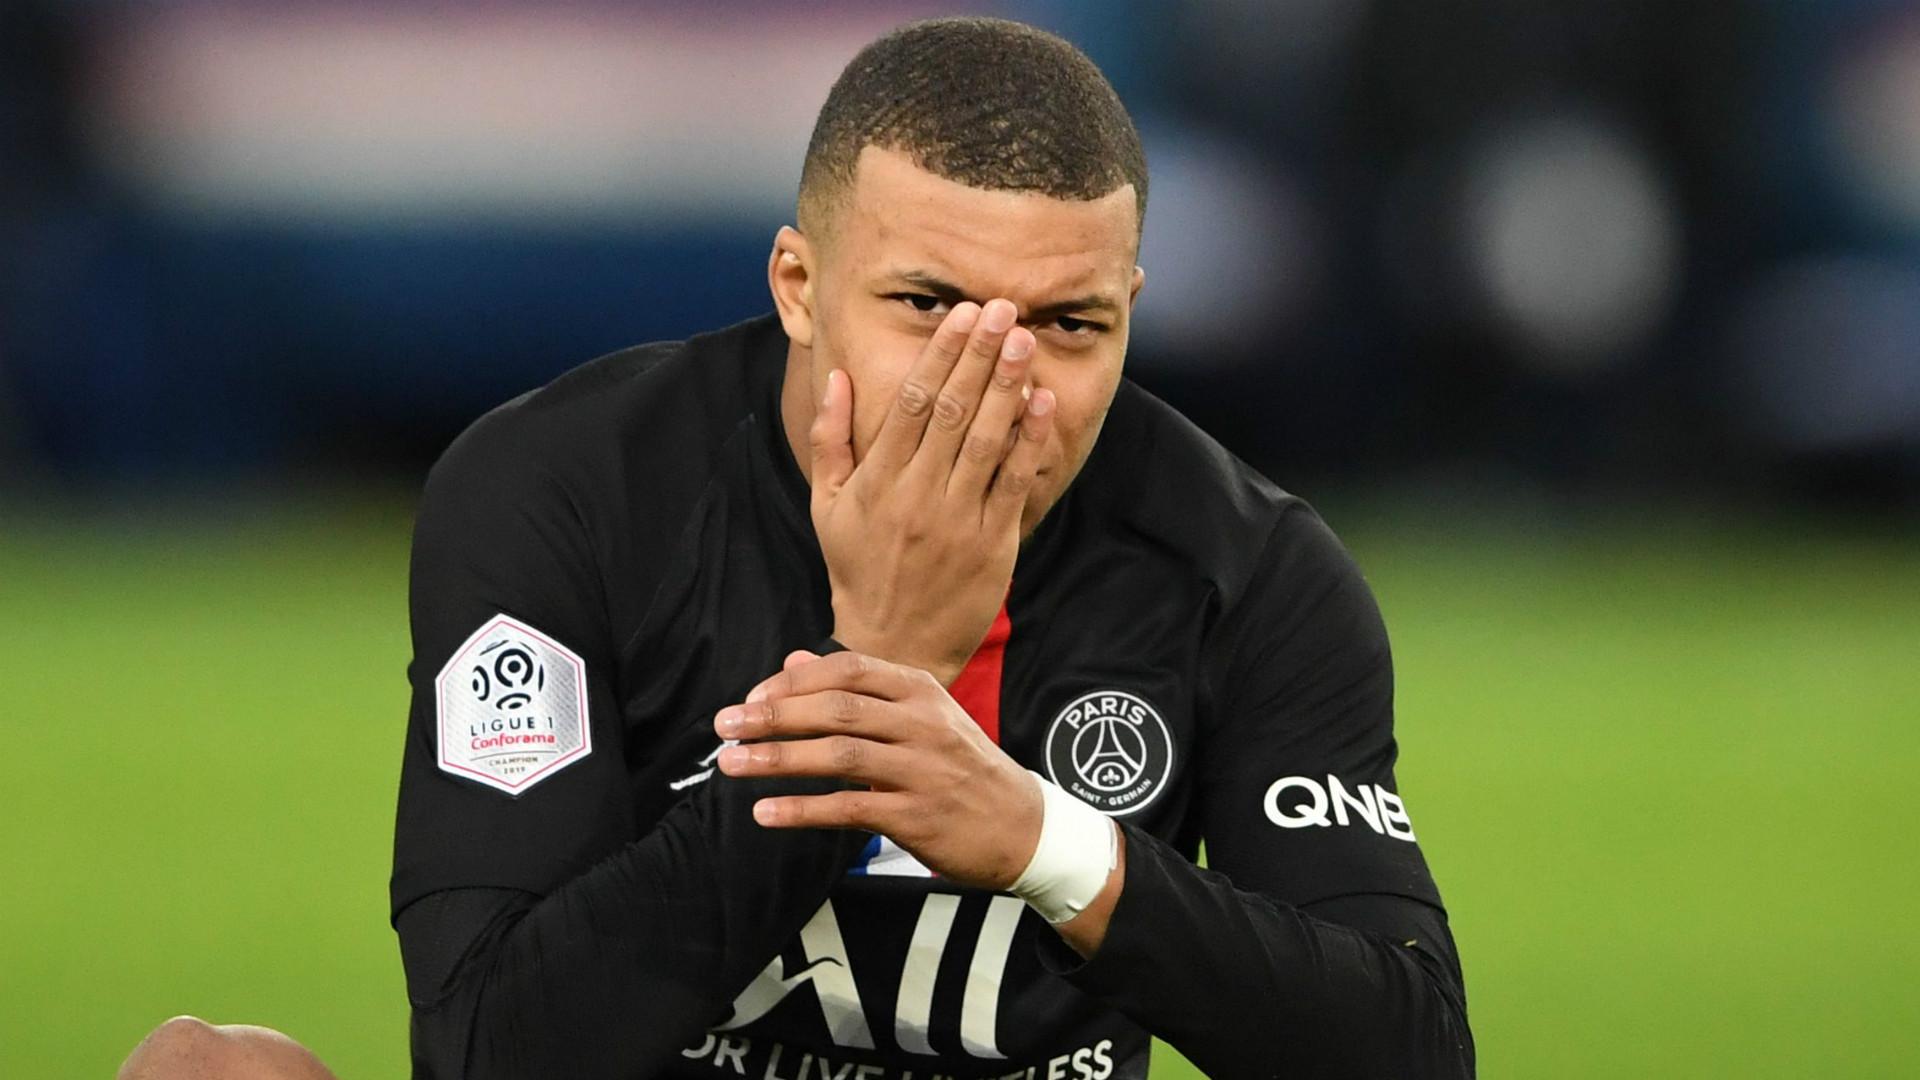 Mbappe misses PSG training through illness ahead of Dortmund clash